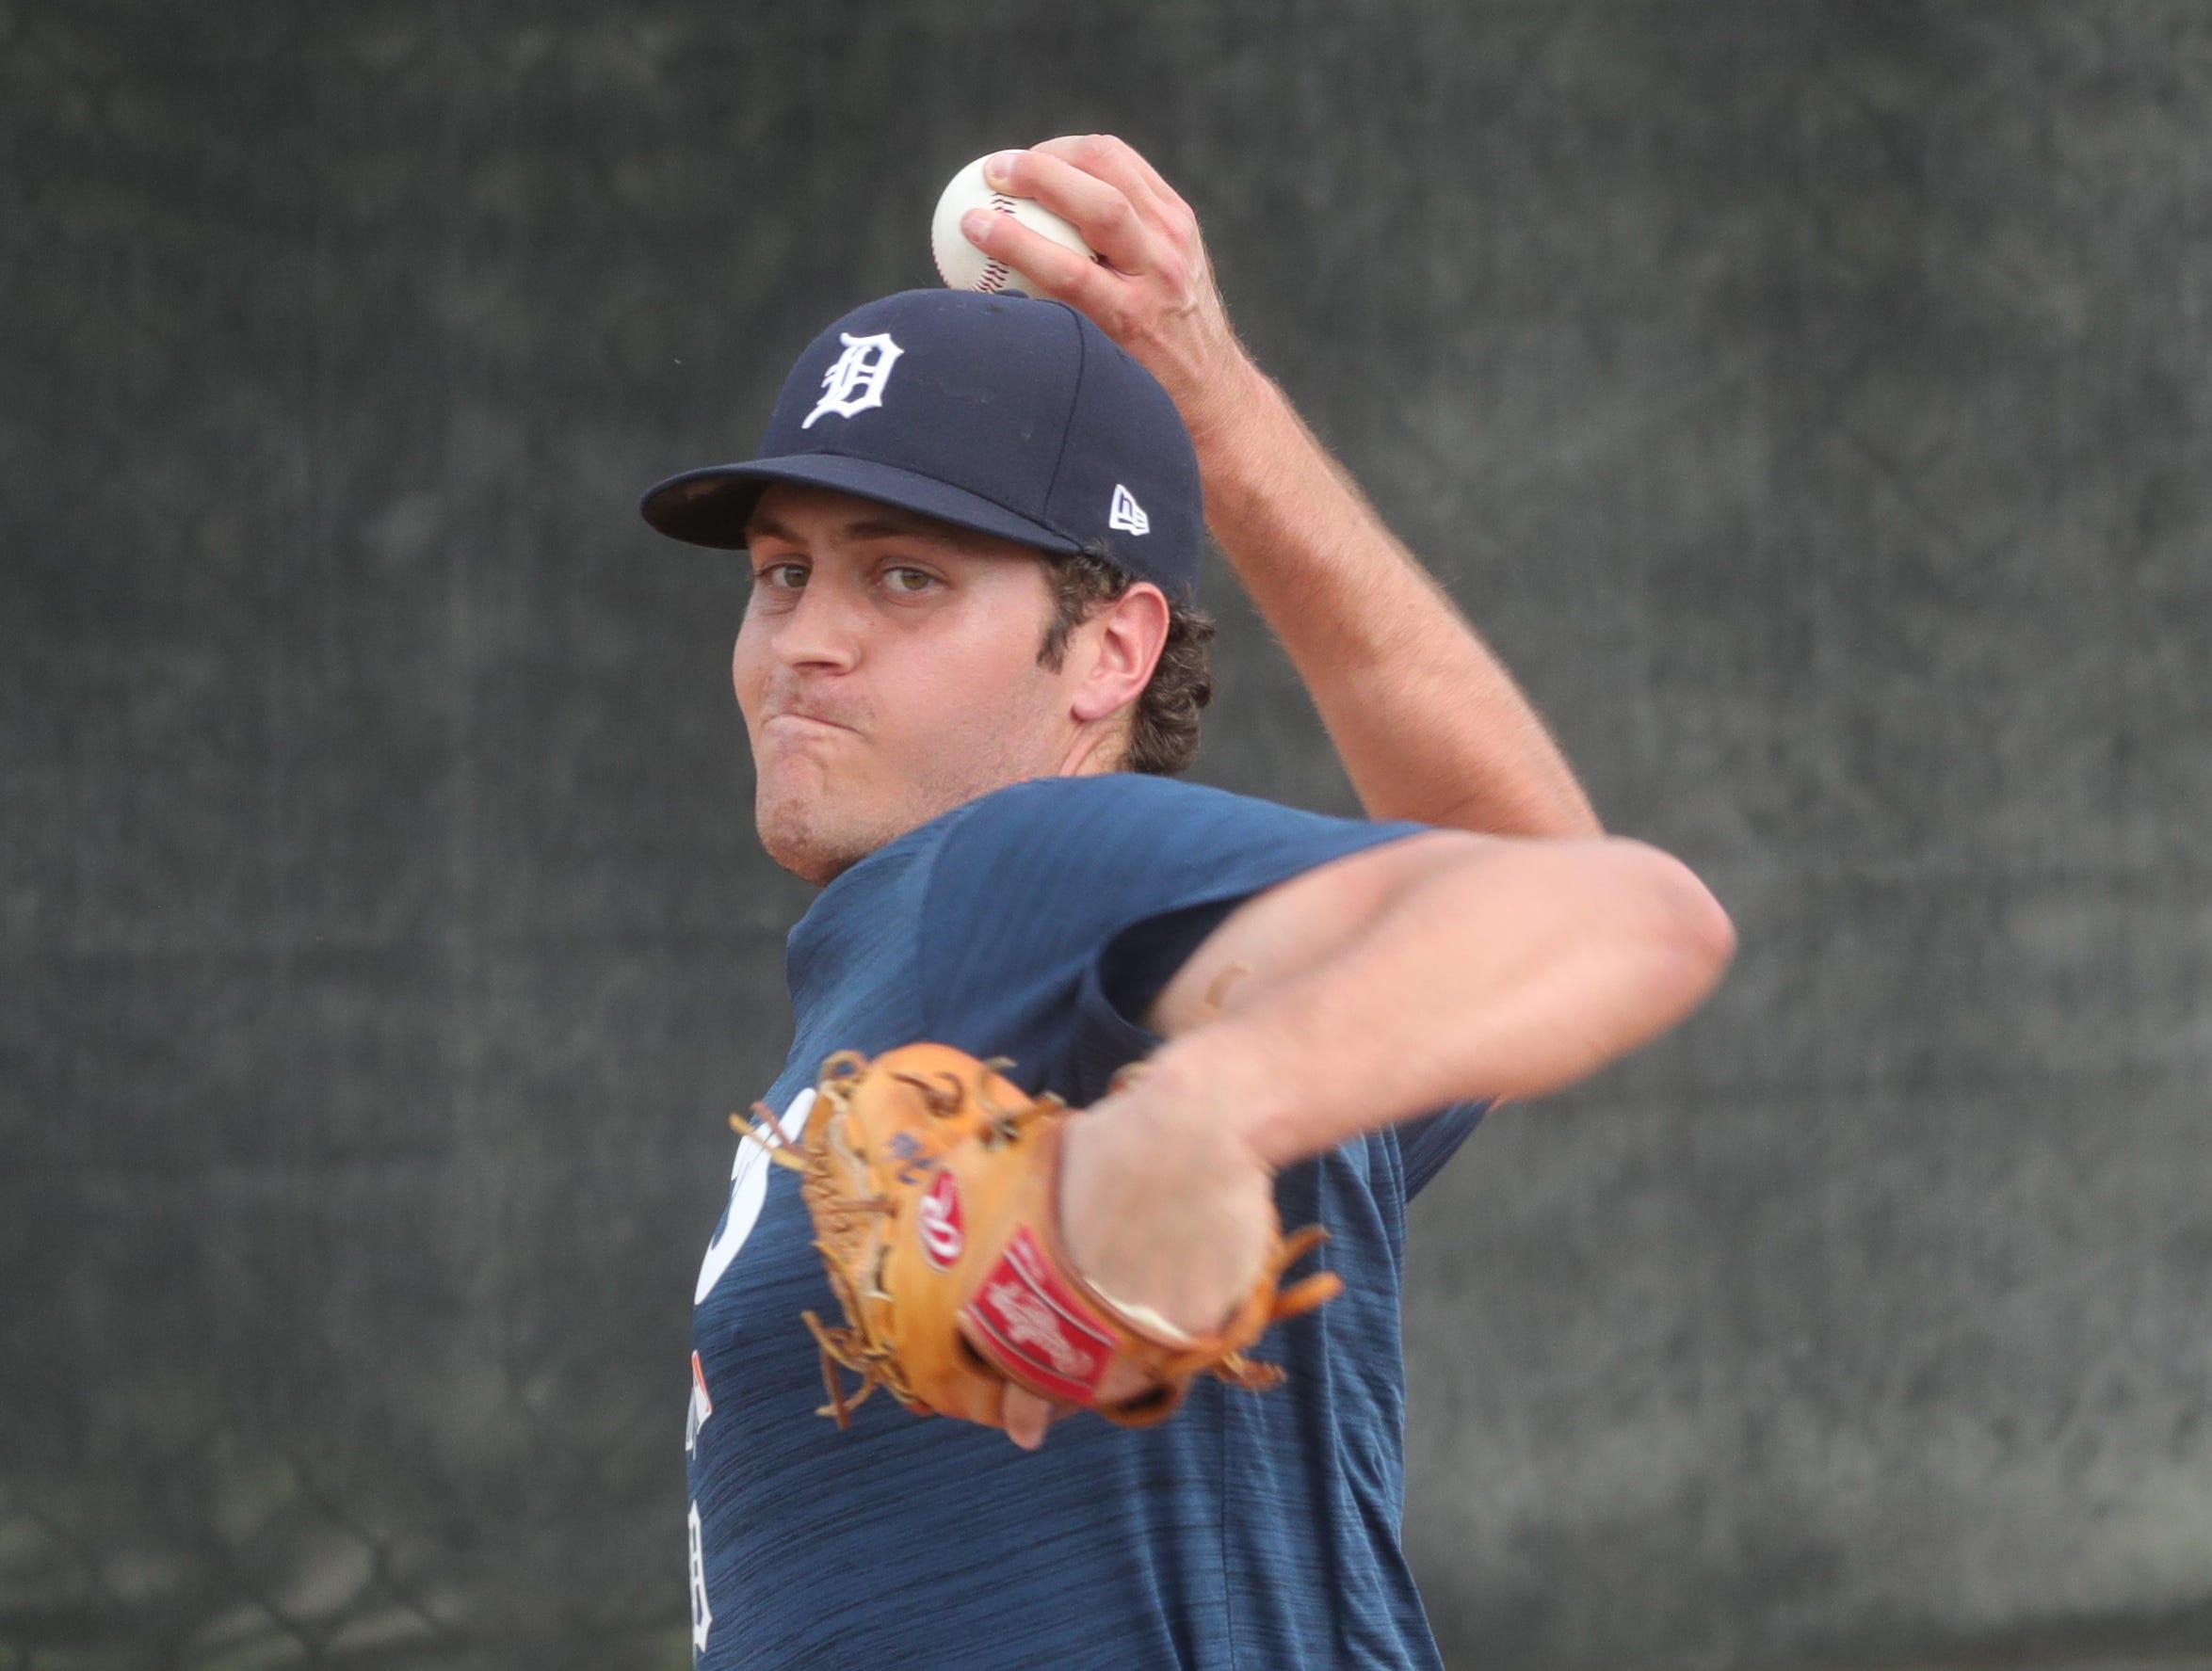 Tigers pitching prospect Jason Foley warms up during spring training Wednesday, Feb. 20, 2019, at Joker Marchant Stadium in Lakeland, Fla.